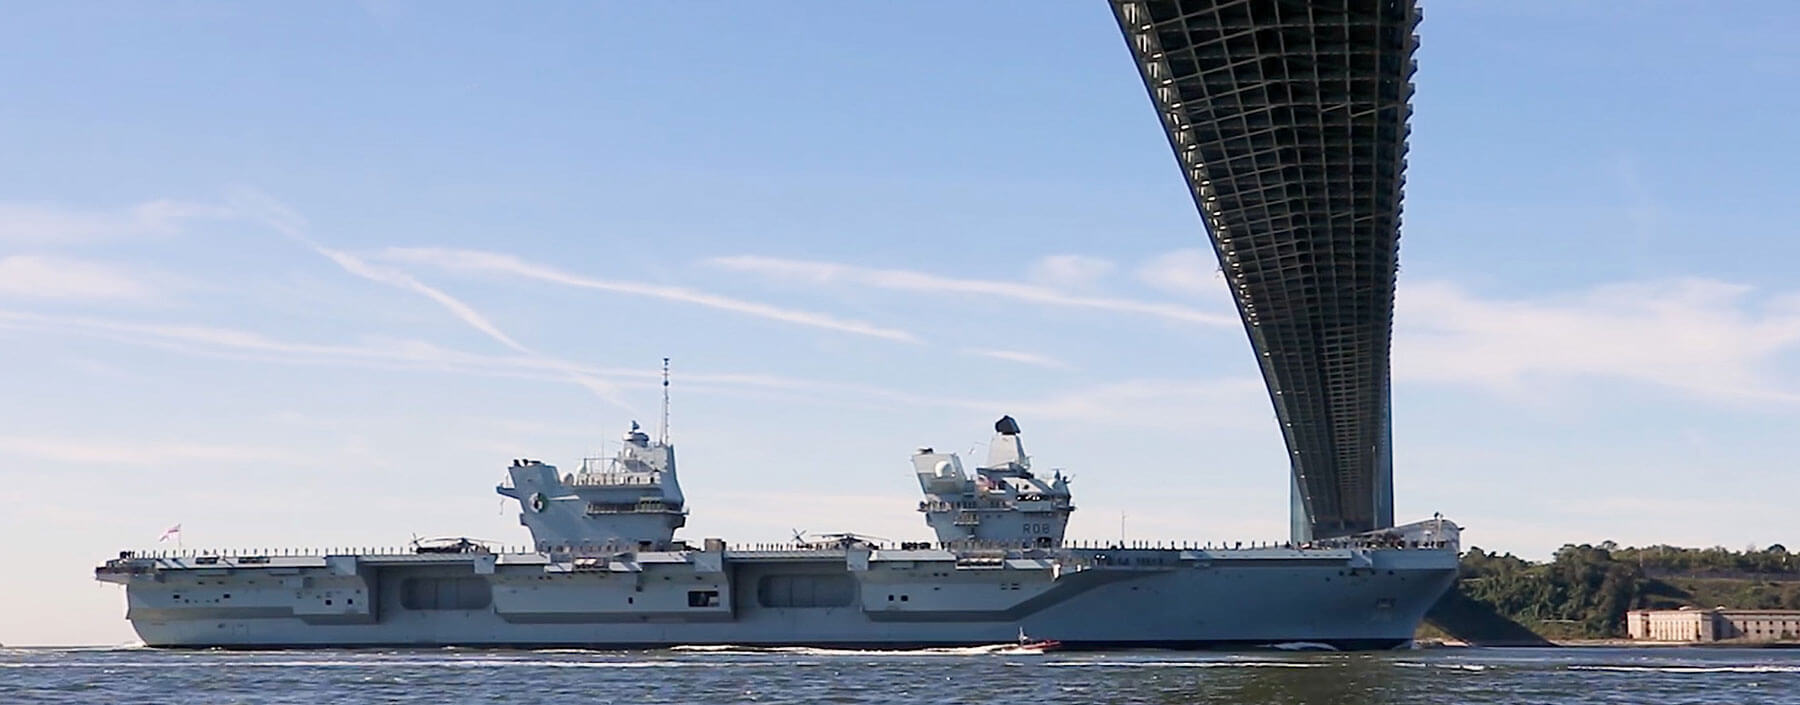 HMS Queen Elizabeth – making an impression in New York